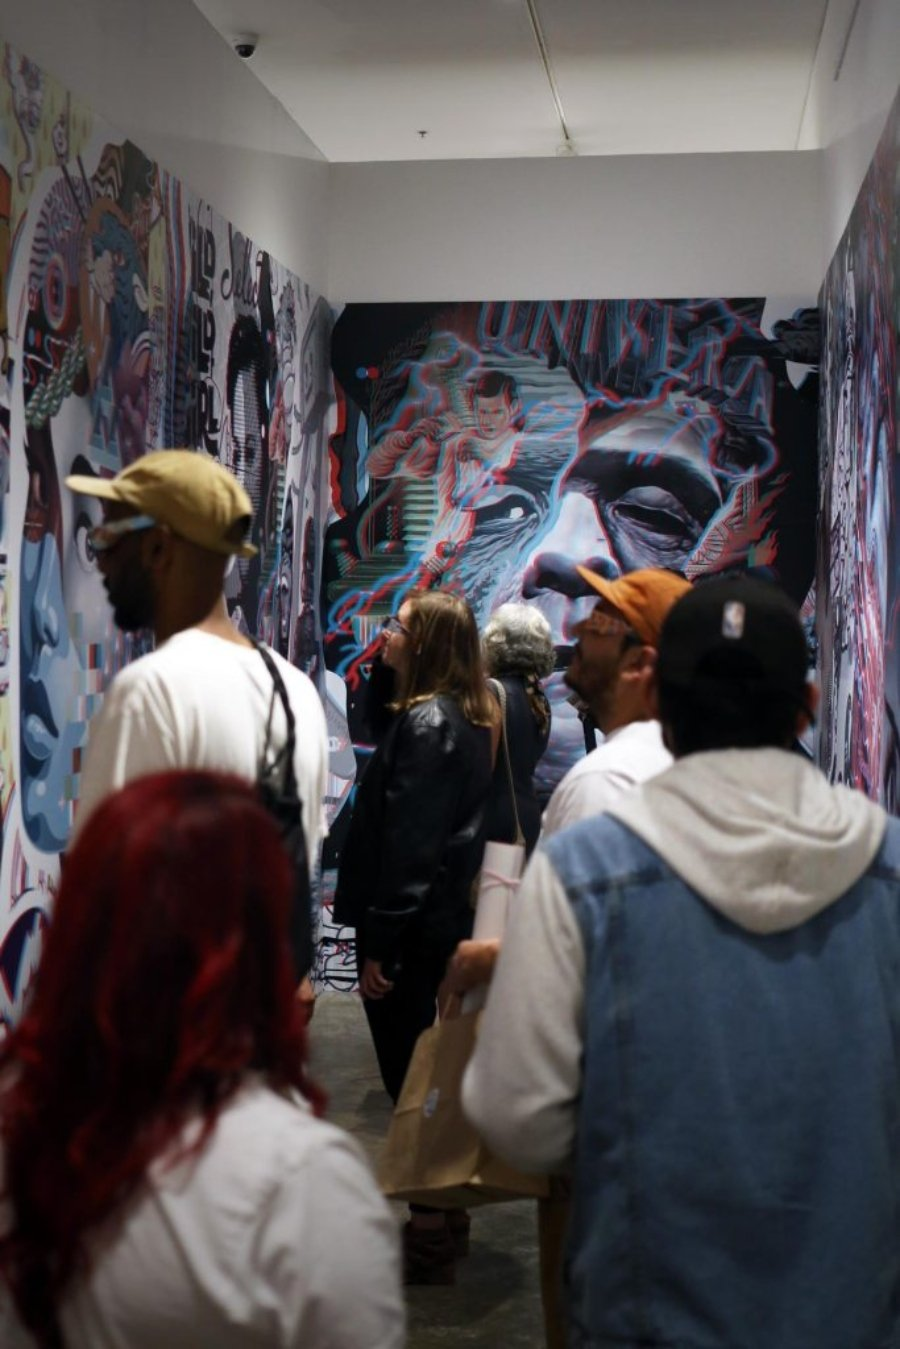 retrospectiva de 25 años de arte de Tristan Eaton